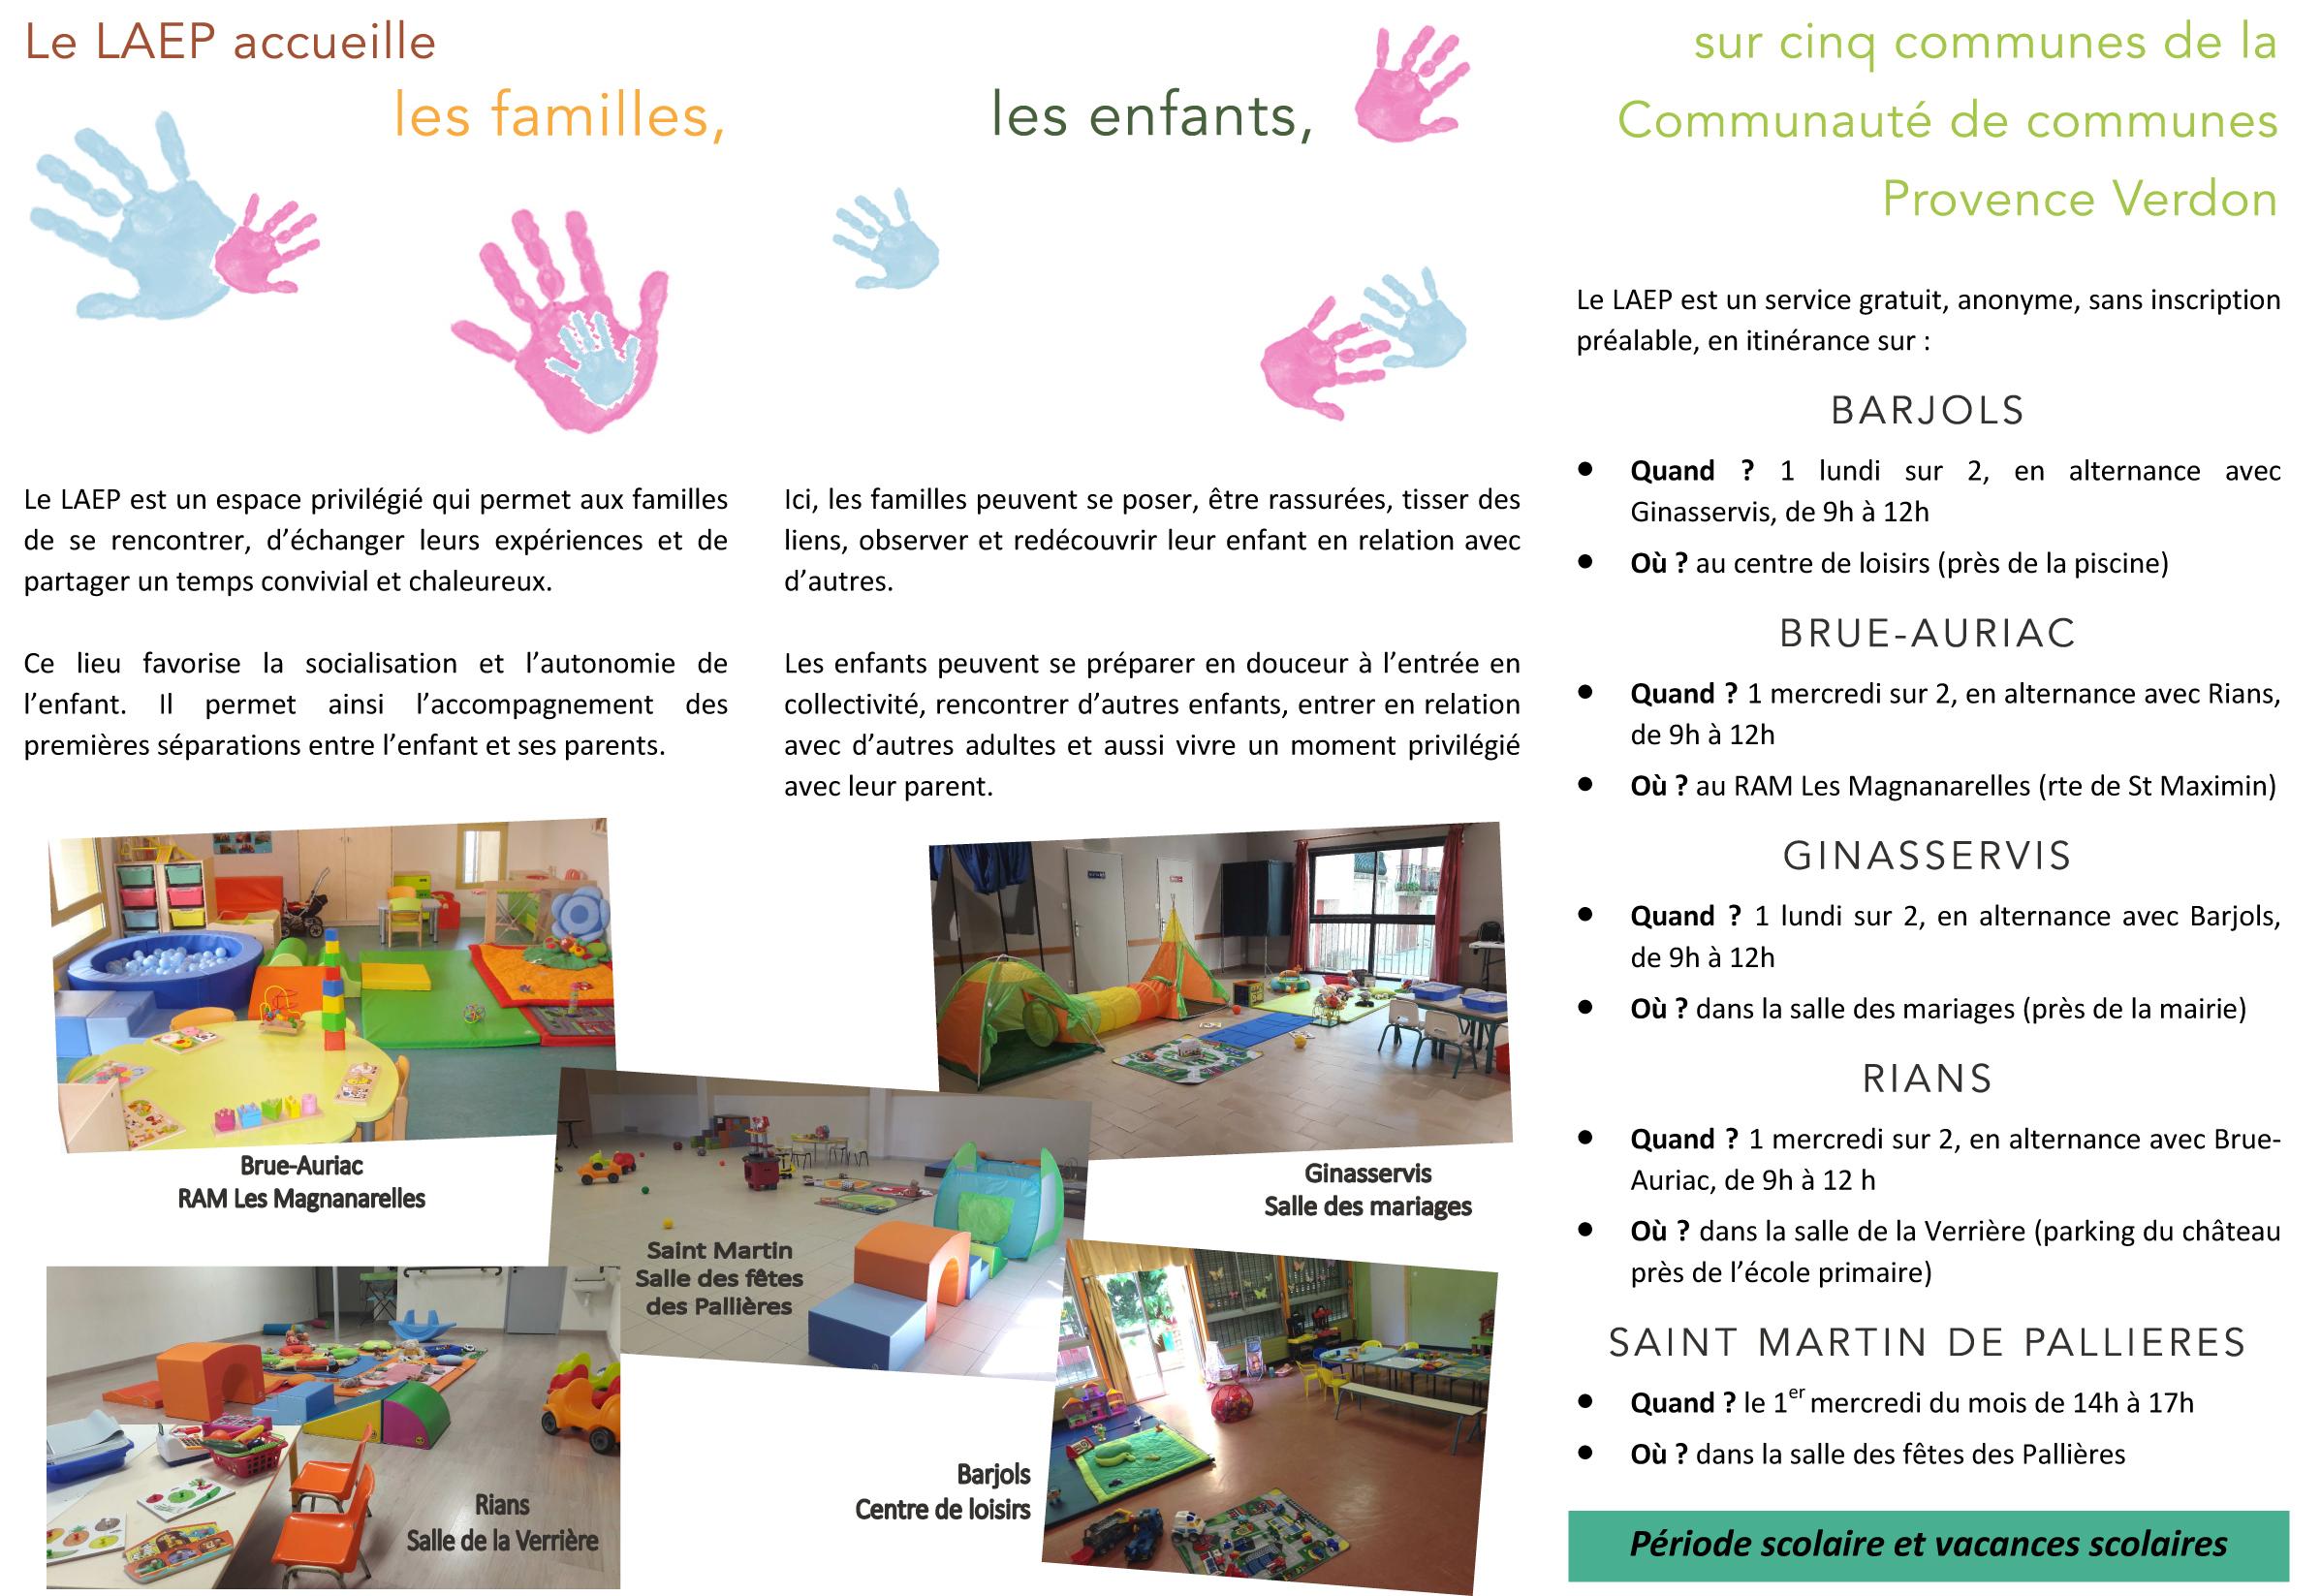 brochure_du_laep_aout_2017_def-2-jpg